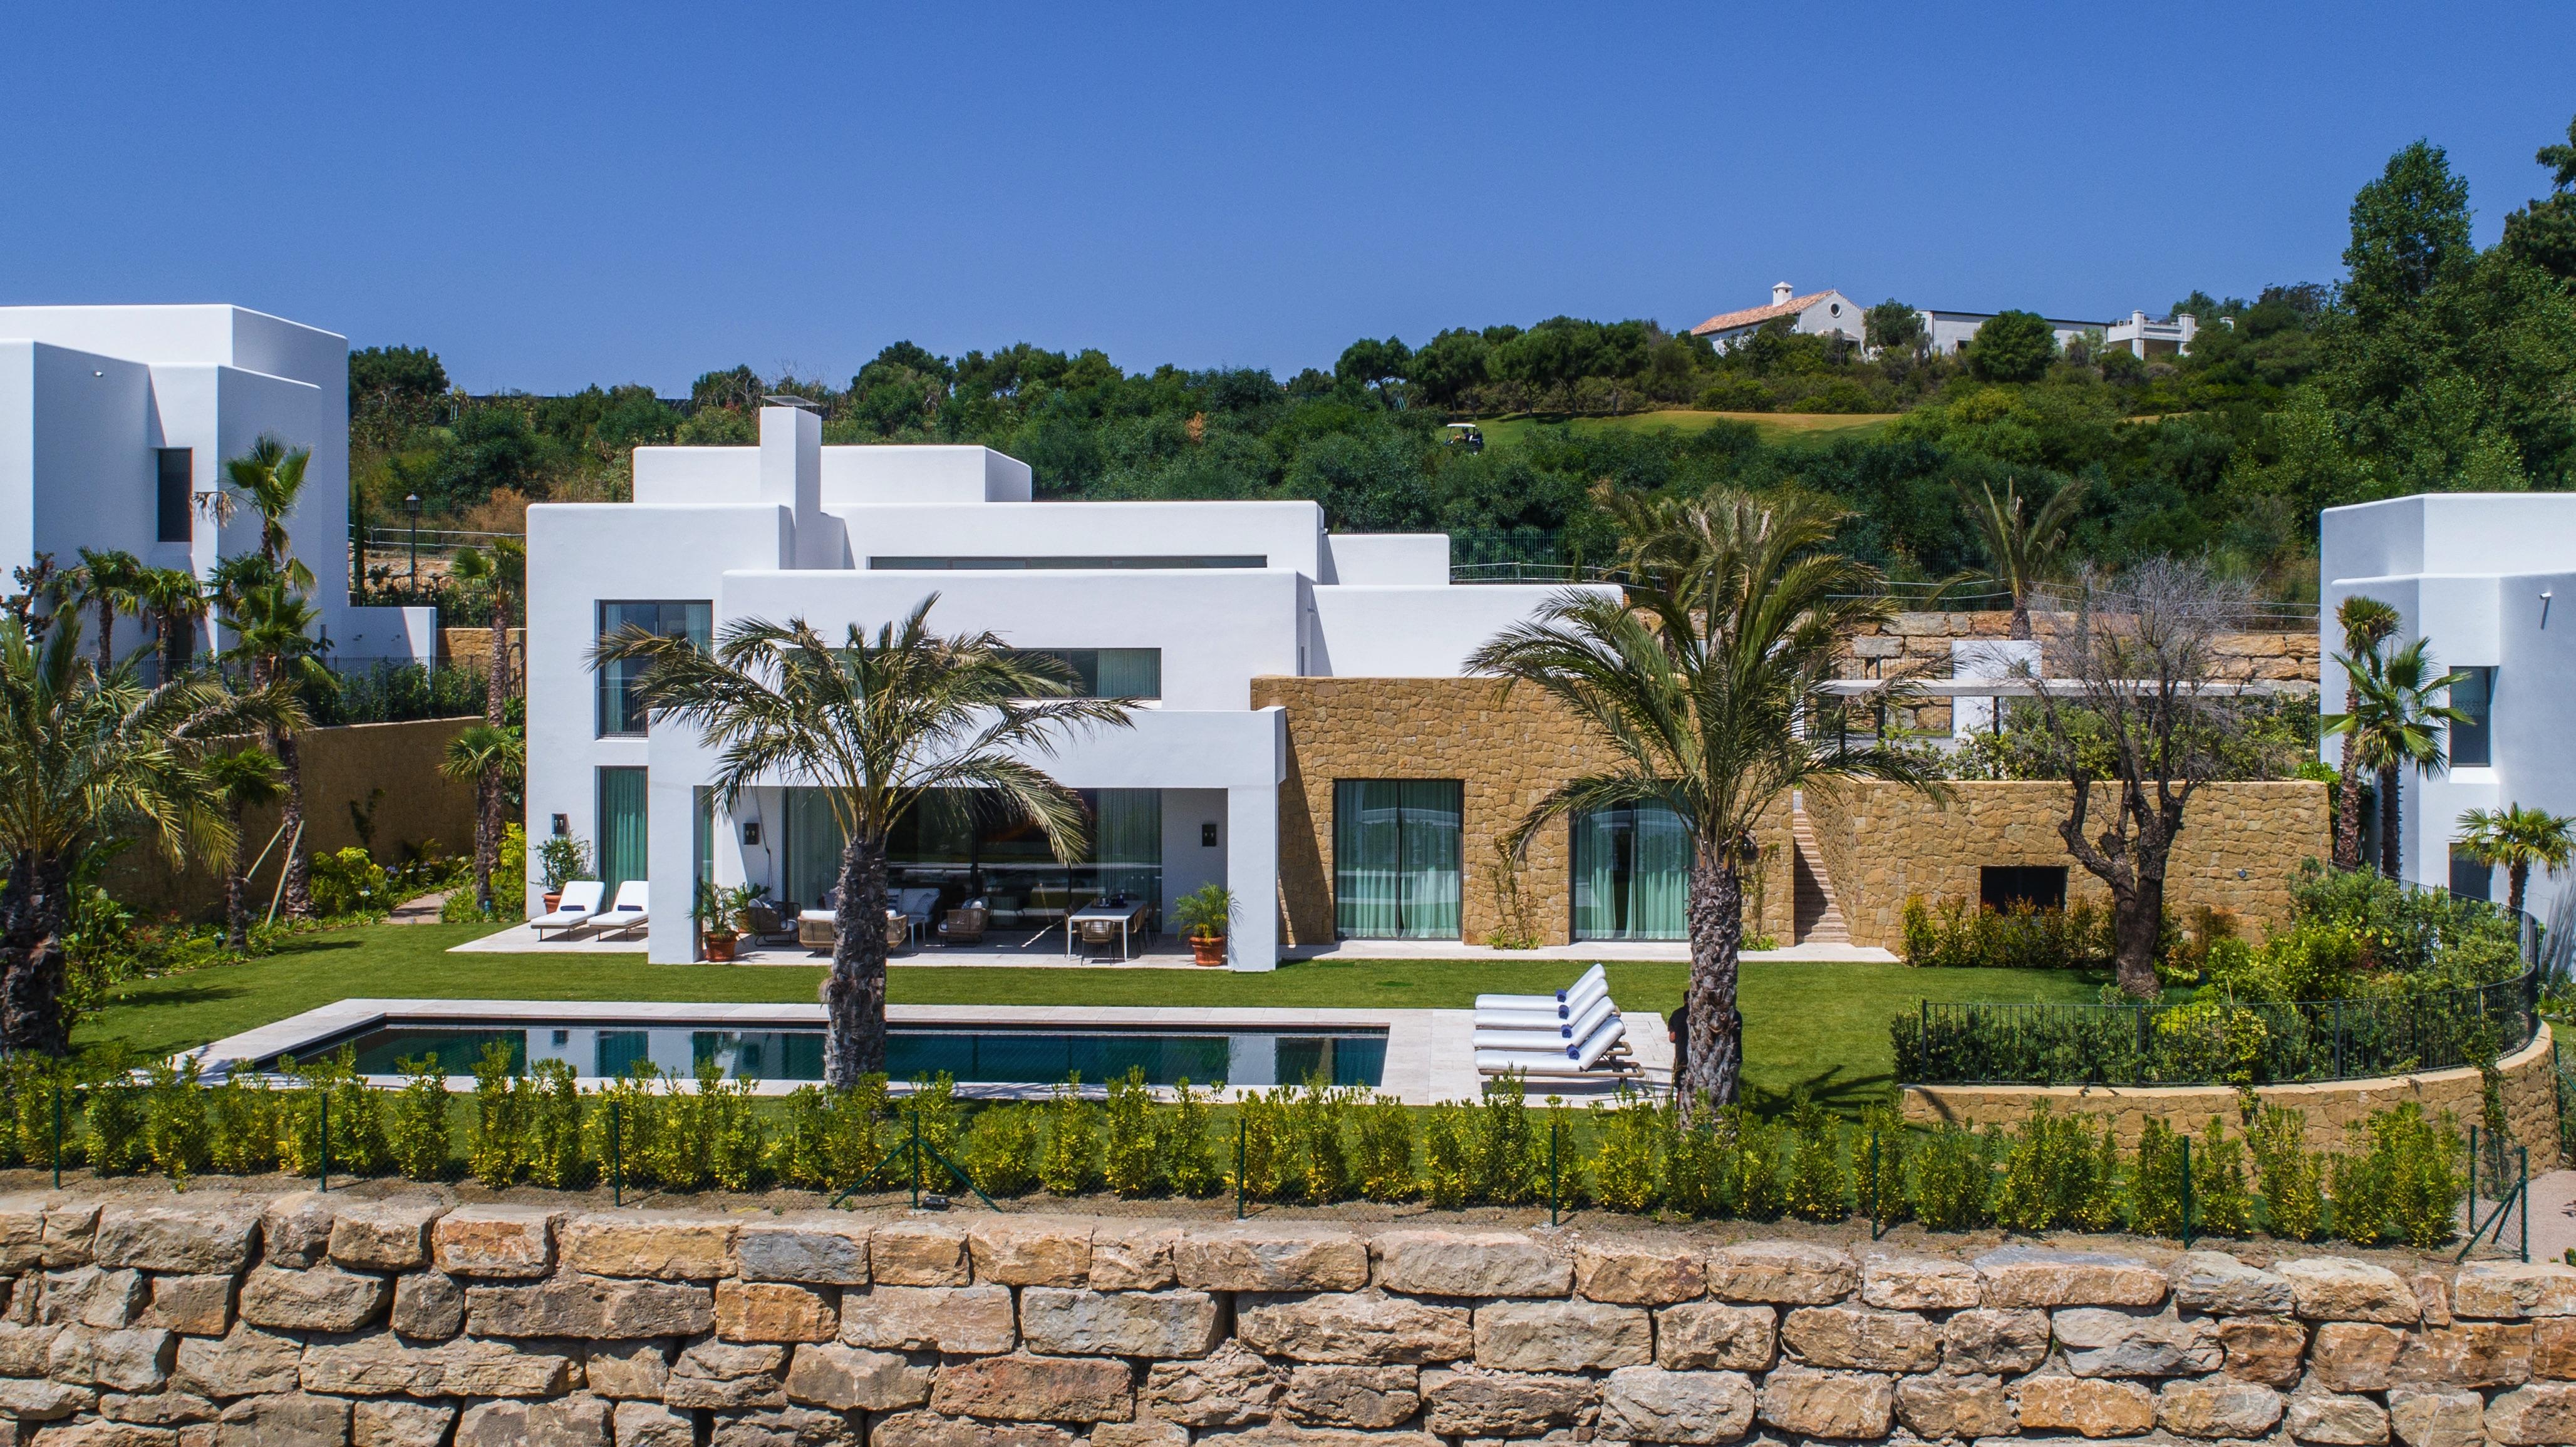 Ref:LUX0143 Villa For Sale in Casares